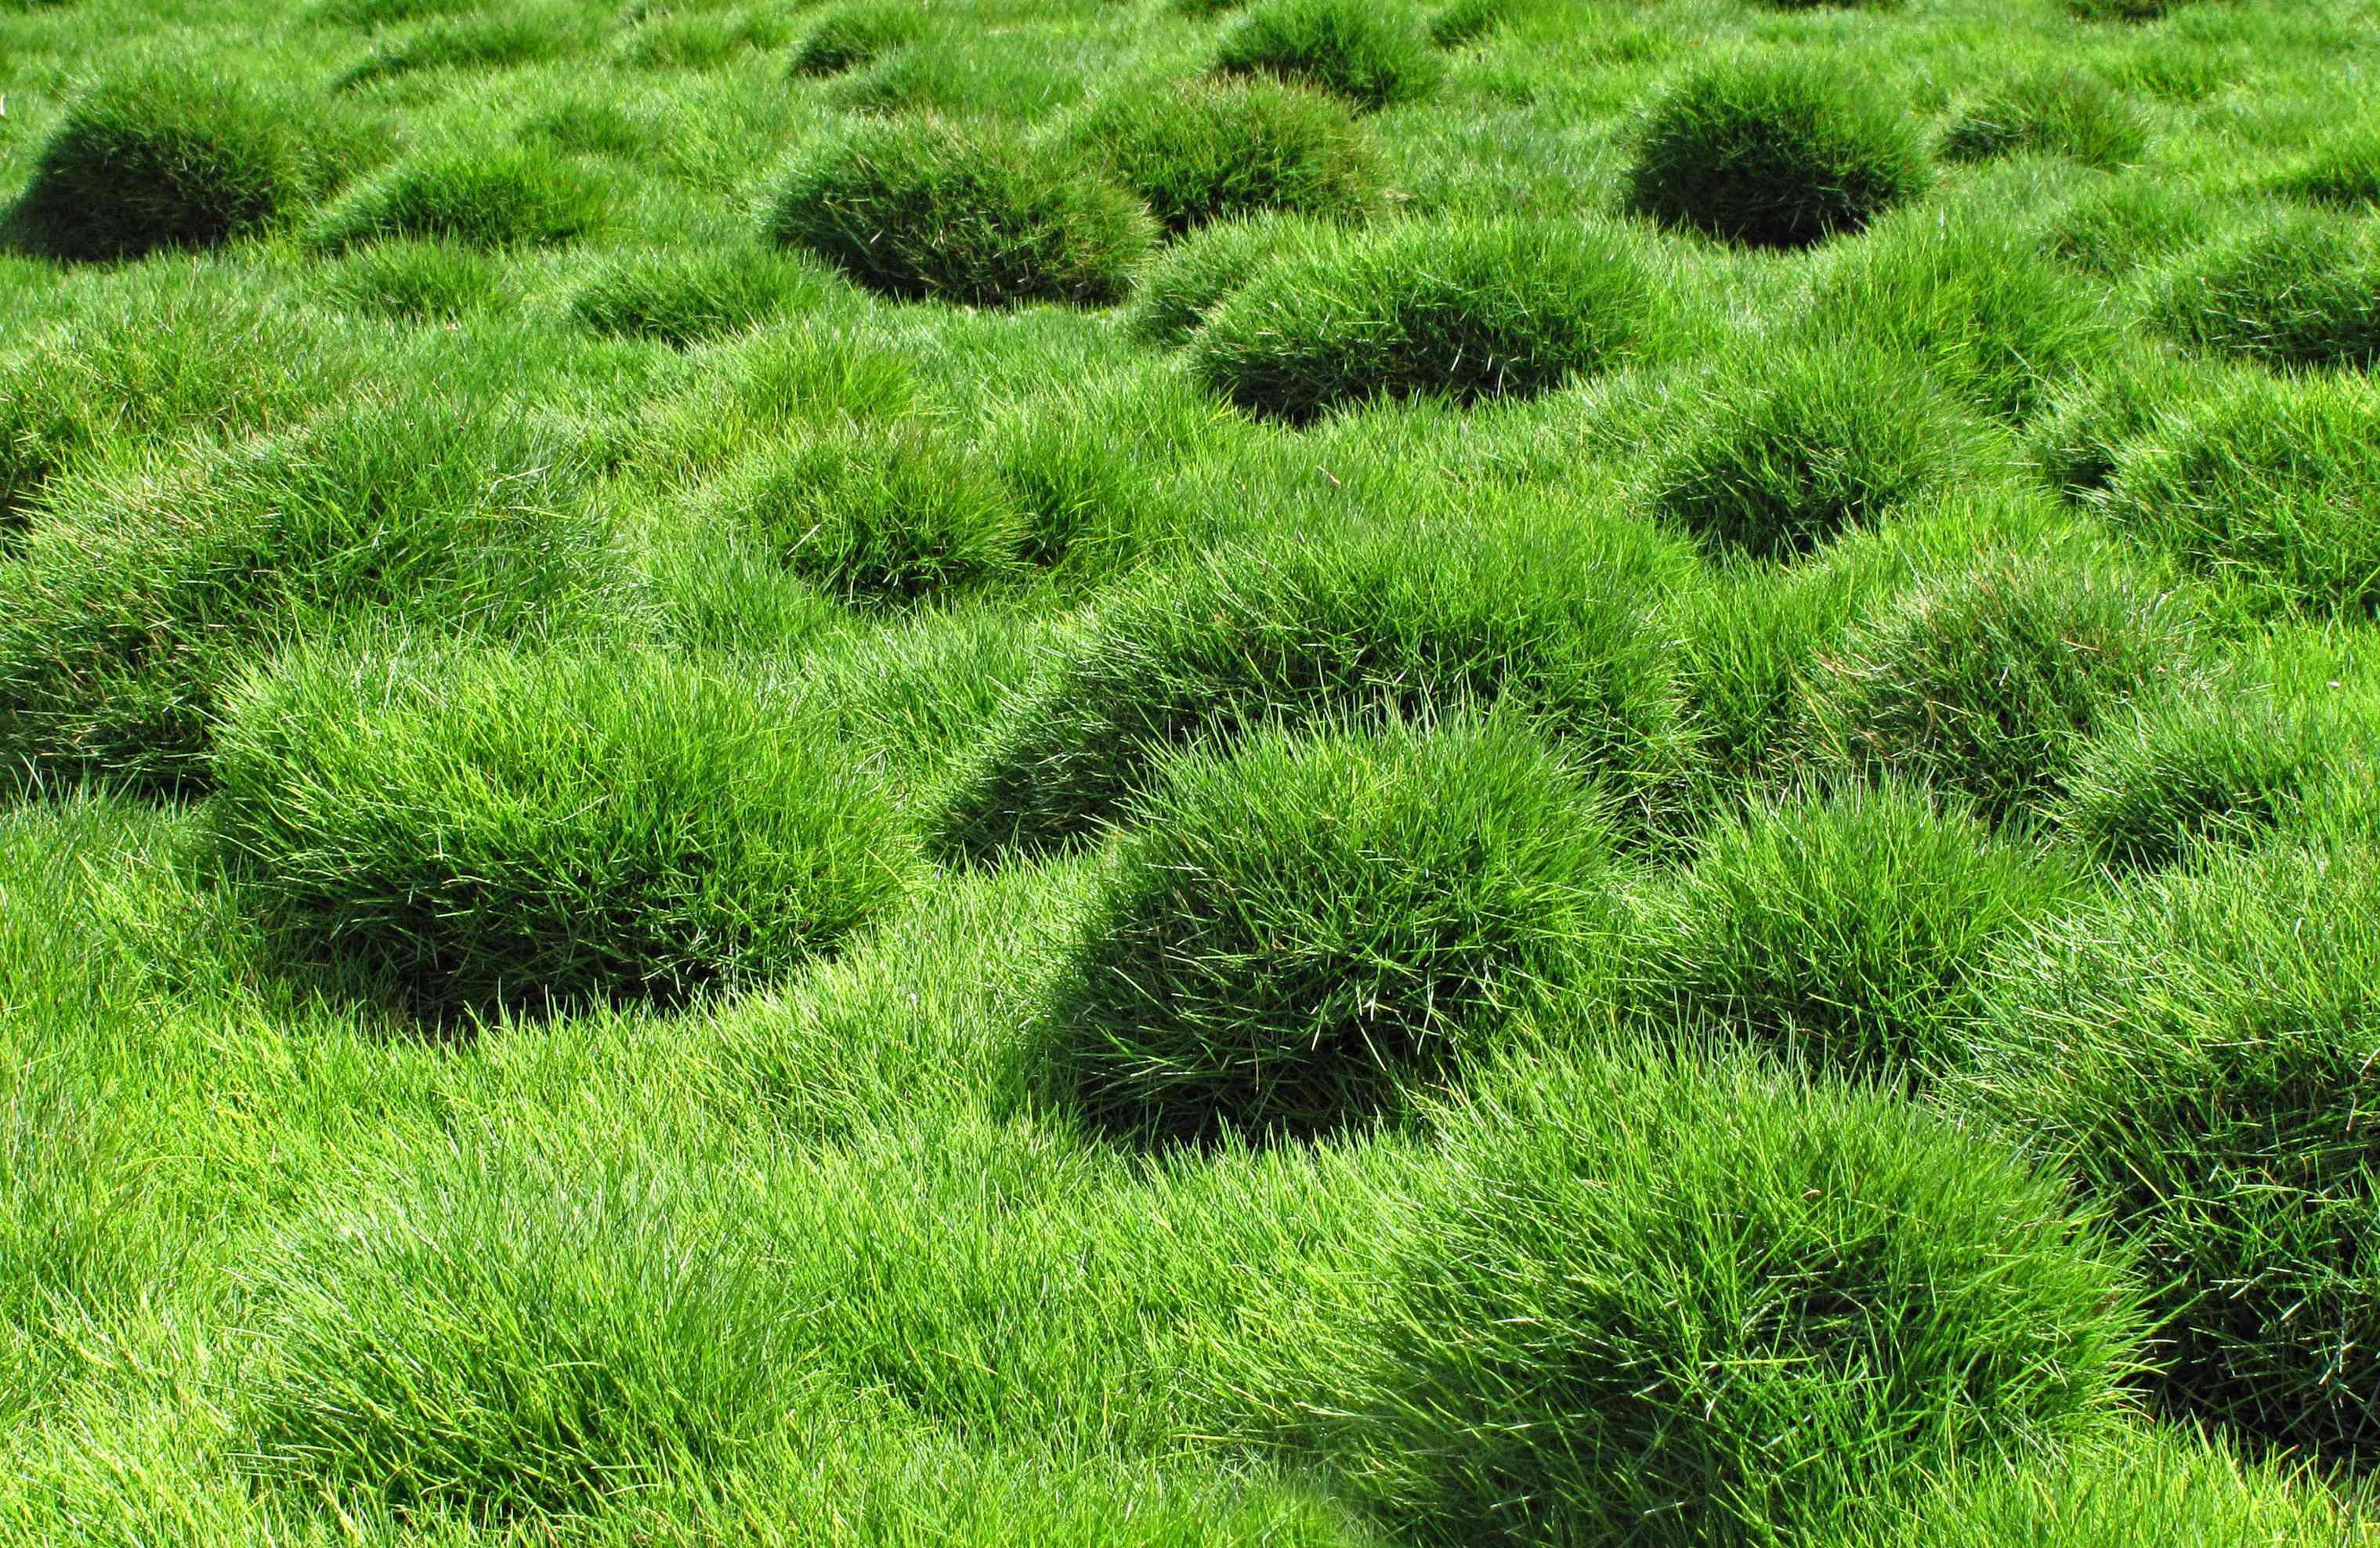 A field of bright green grass